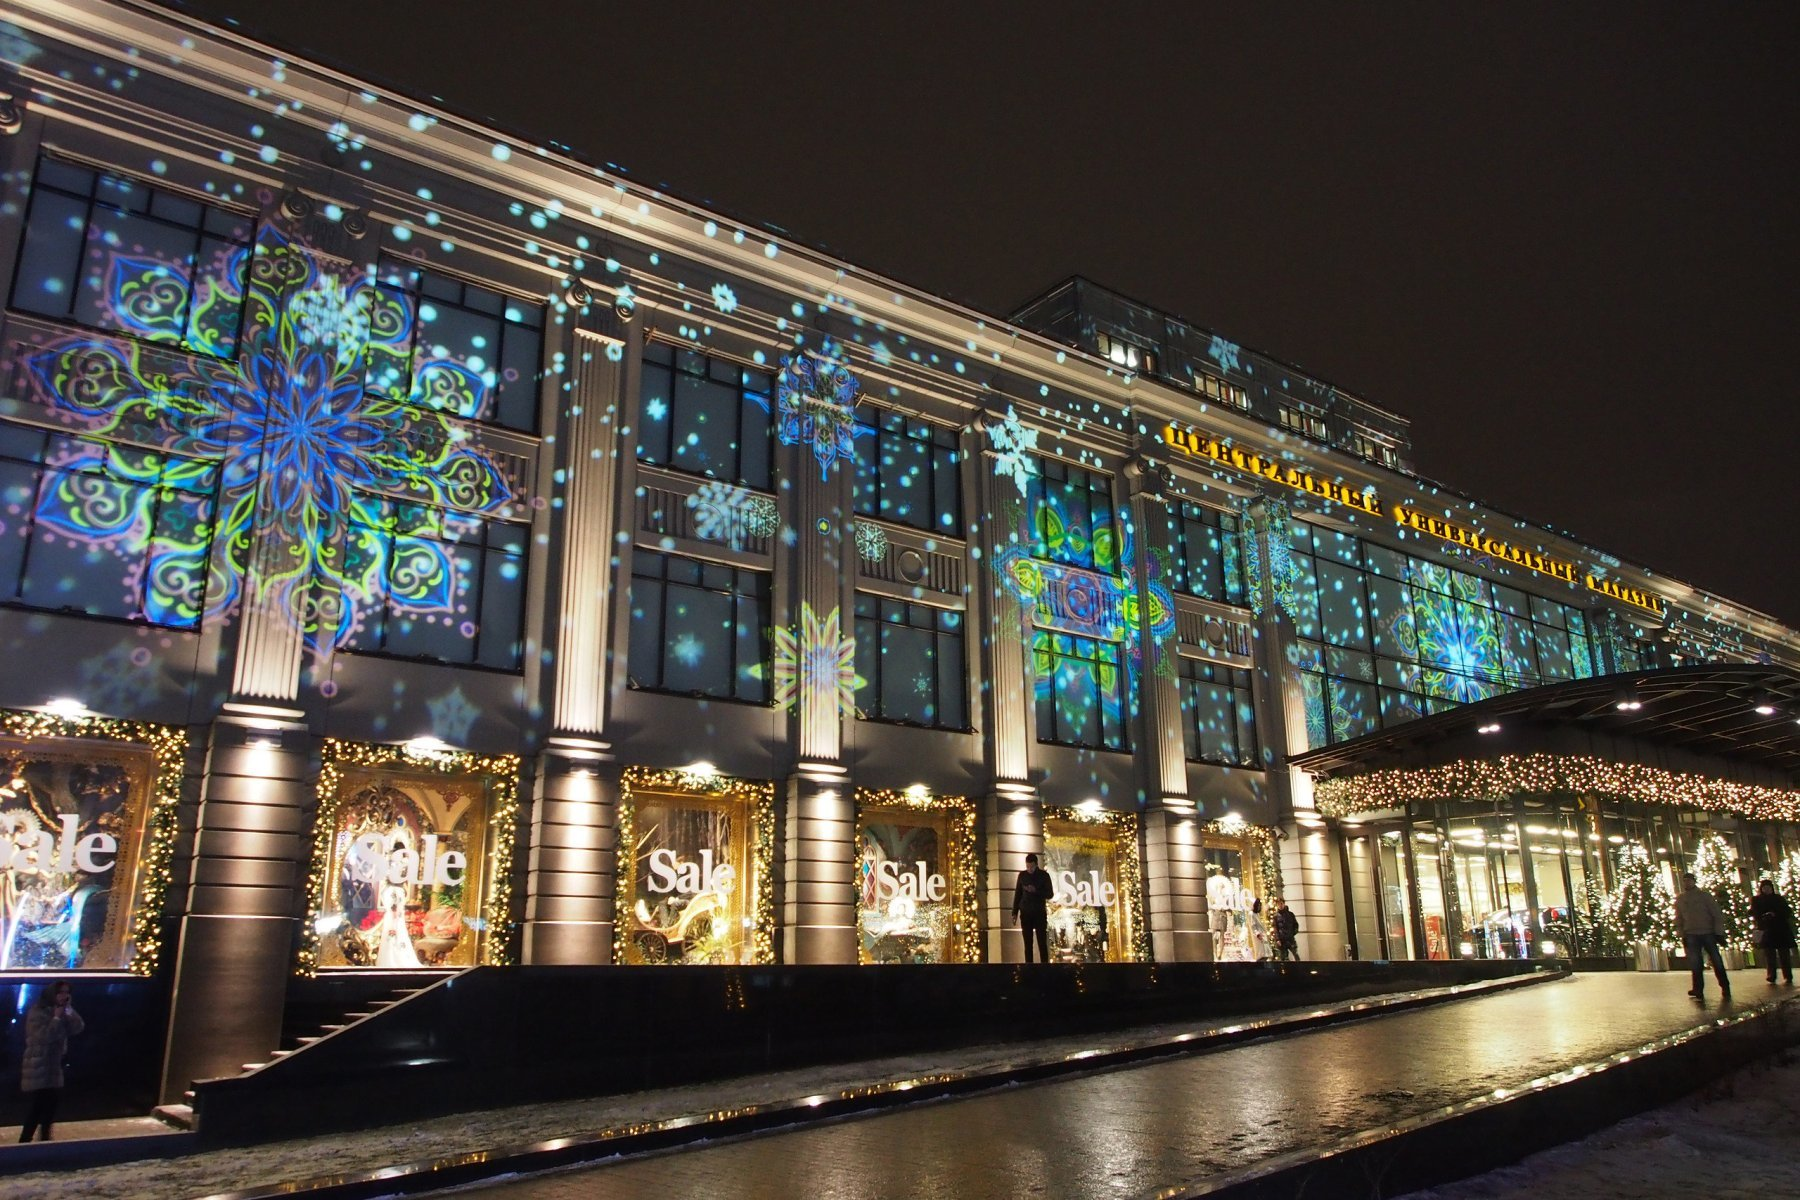 a2a137667b7 ЦУМ в Москве. Официальный сайт